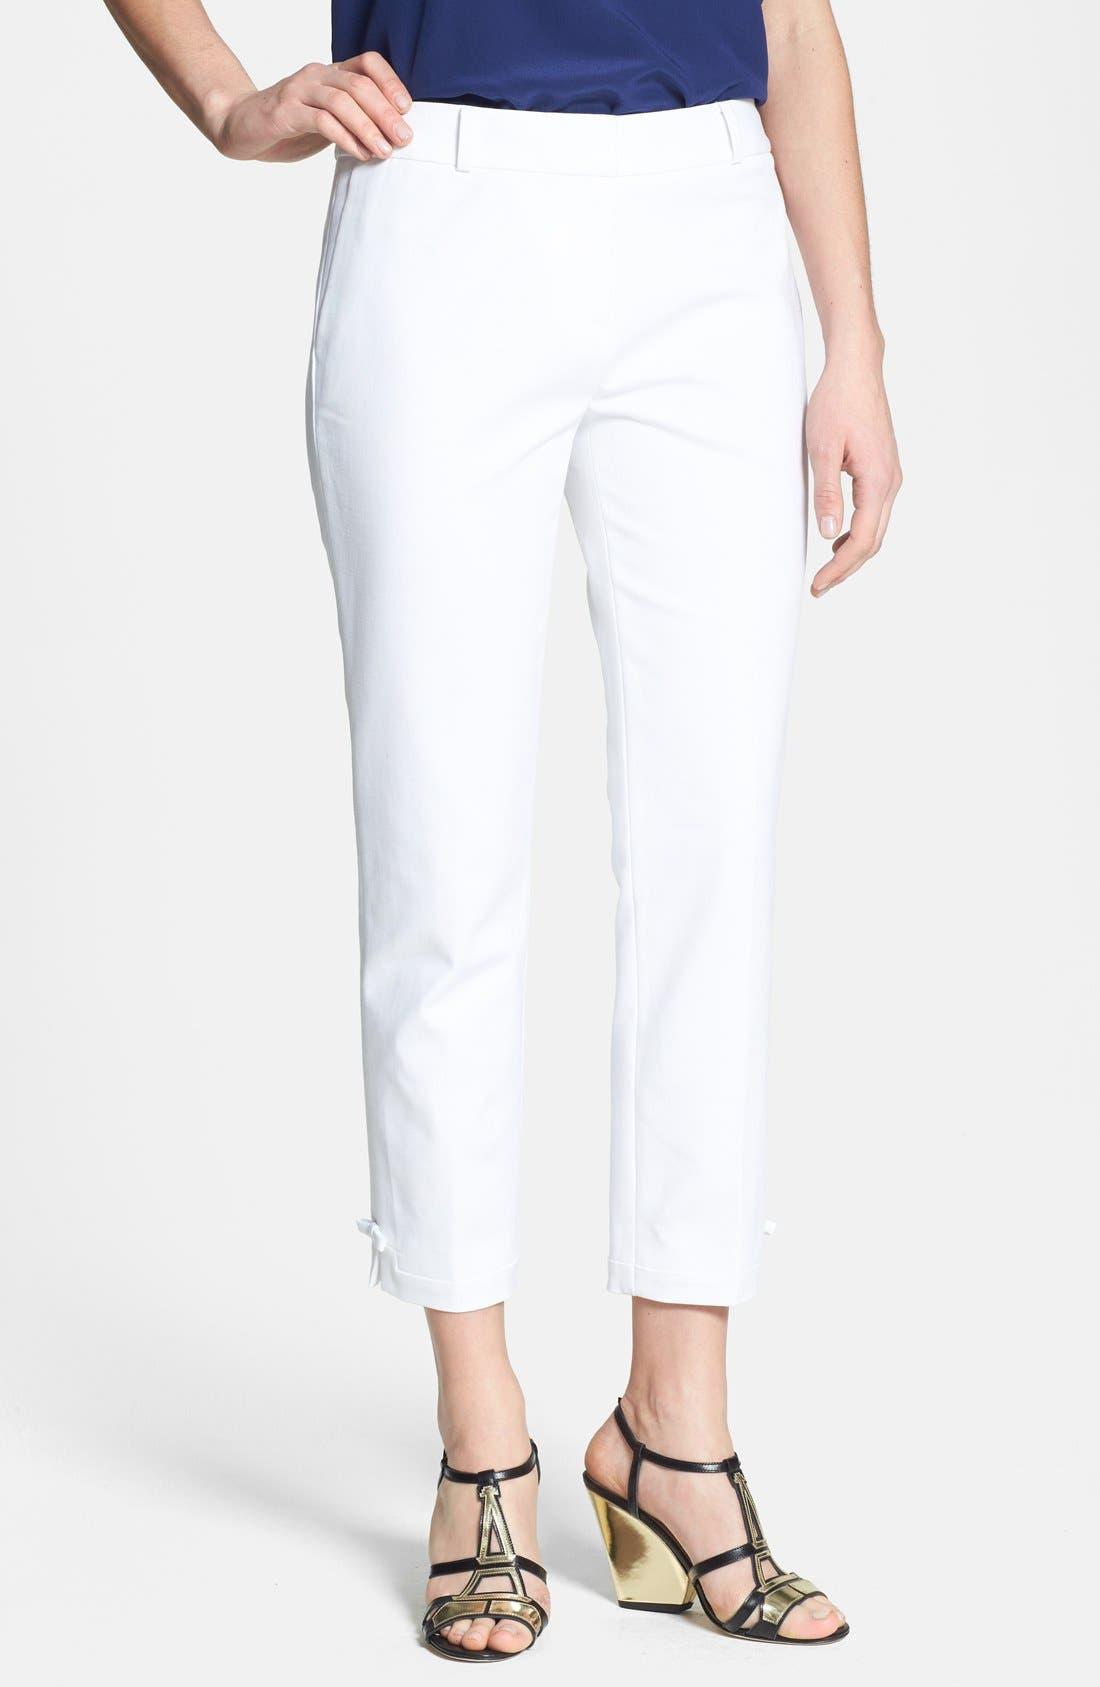 Alternate Image 1 Selected - kate spade new york 'jackie' stretch cotton capri pants